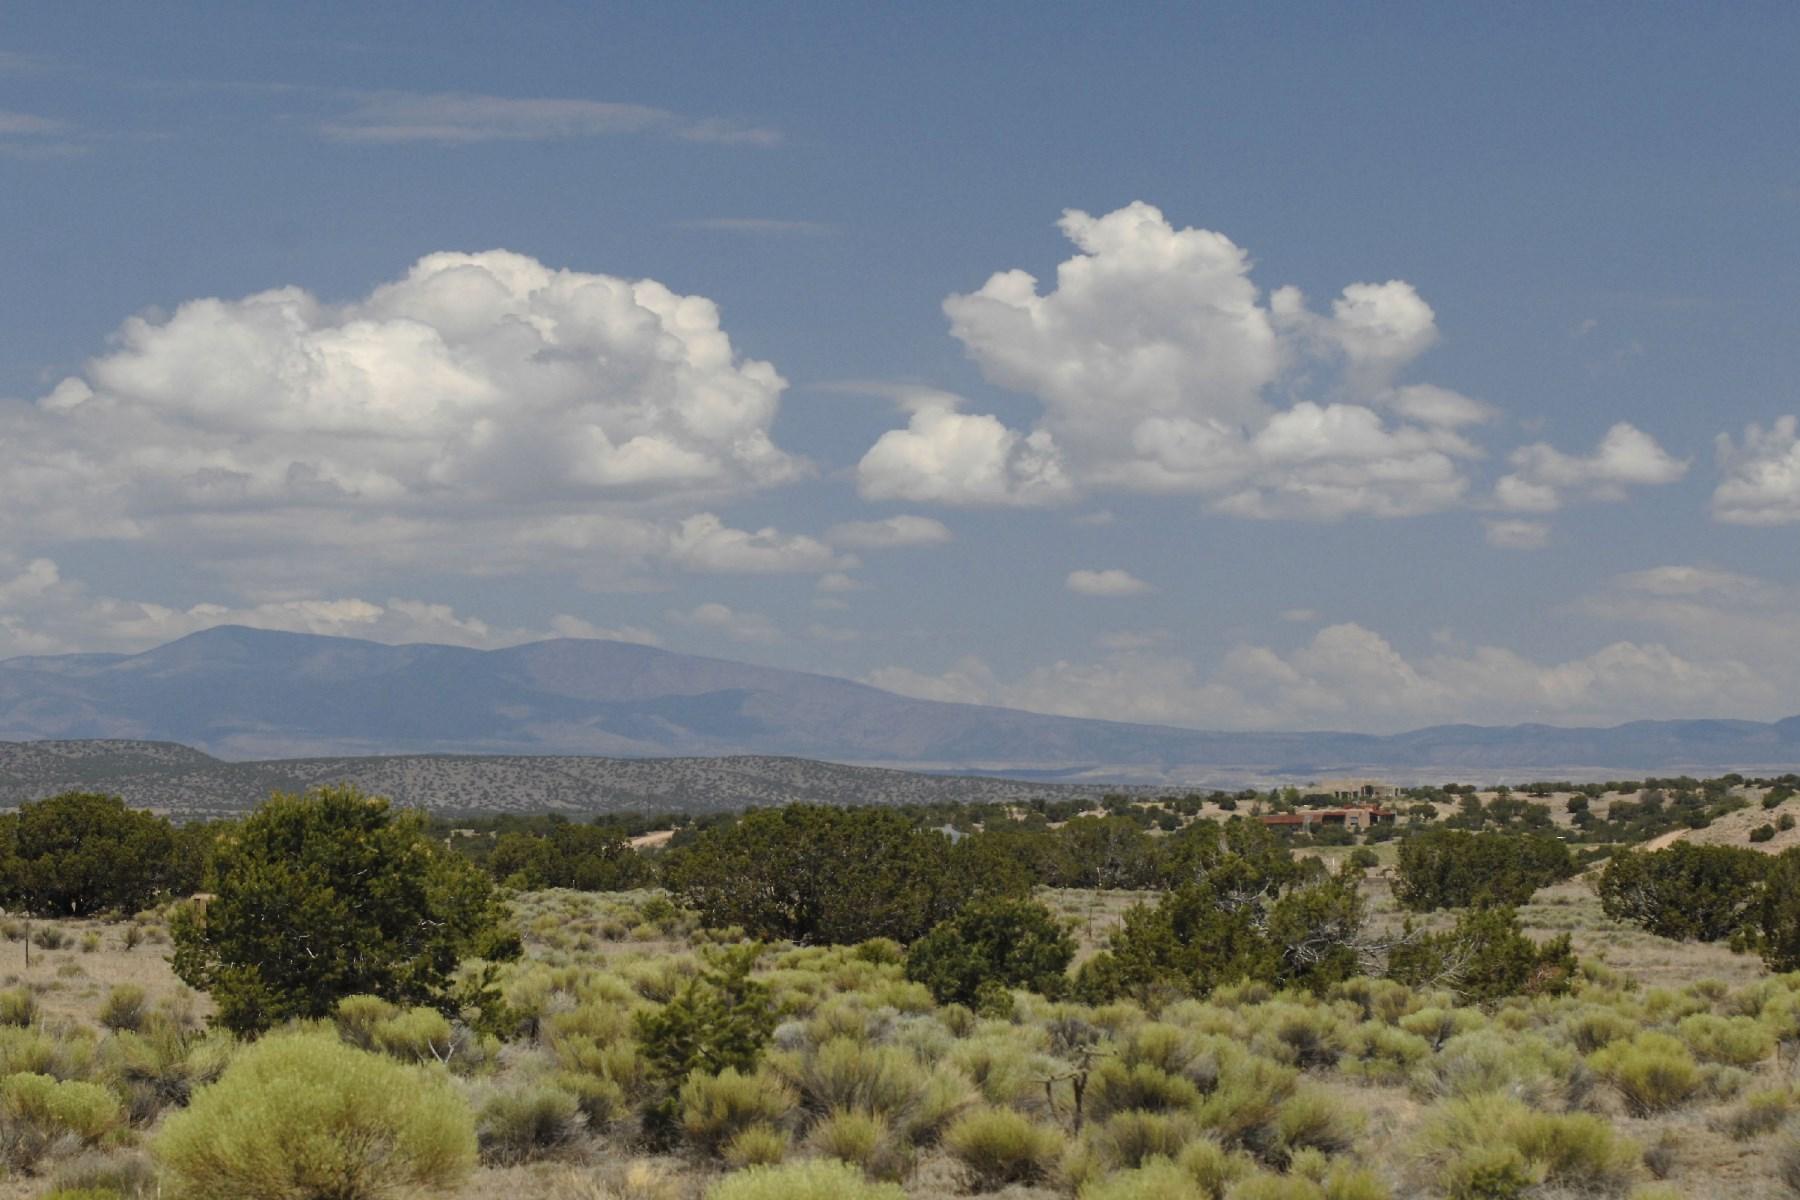 Land for Sale at 141-A Paseo Aragon, Lot #59 Las Campanas & Los Santeros, Santa Fe, New Mexico 87506 United States